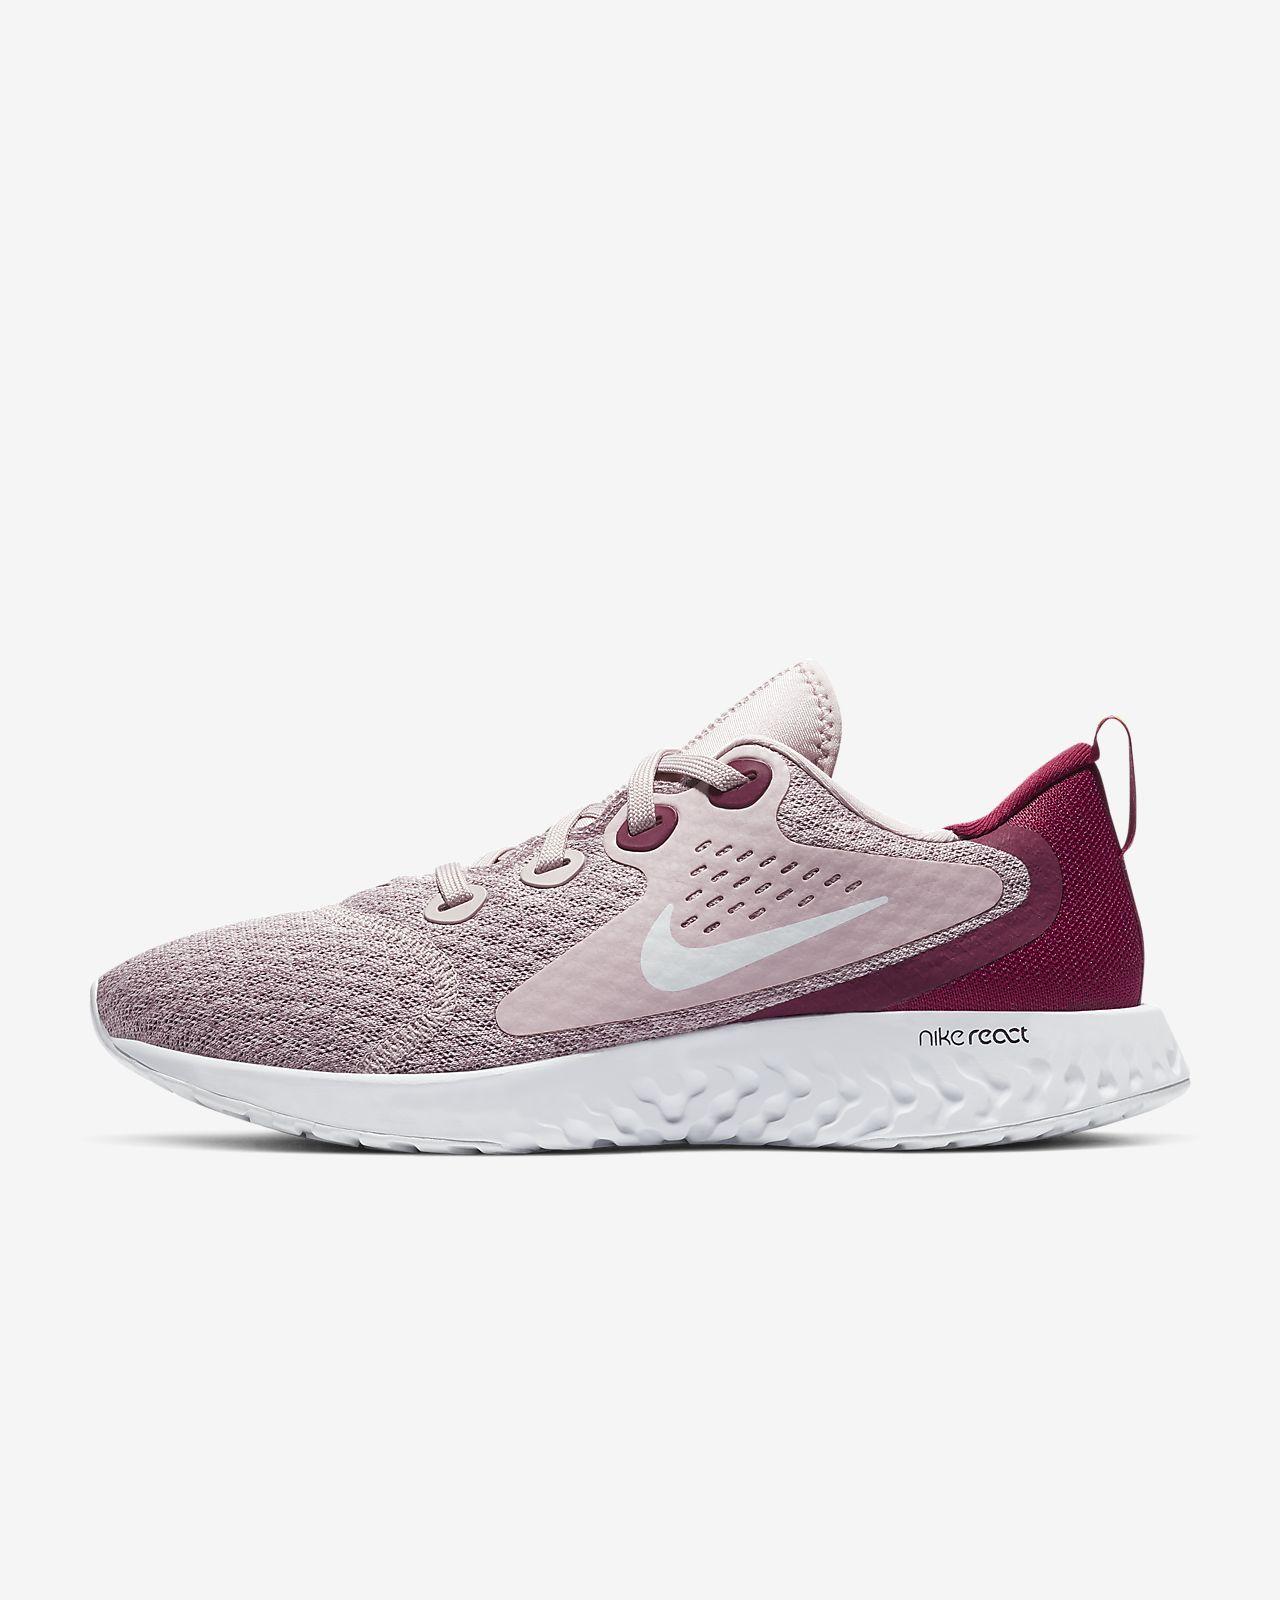 check out 9cfa2 596de ... Löparsko Nike Legend React för kvinnor